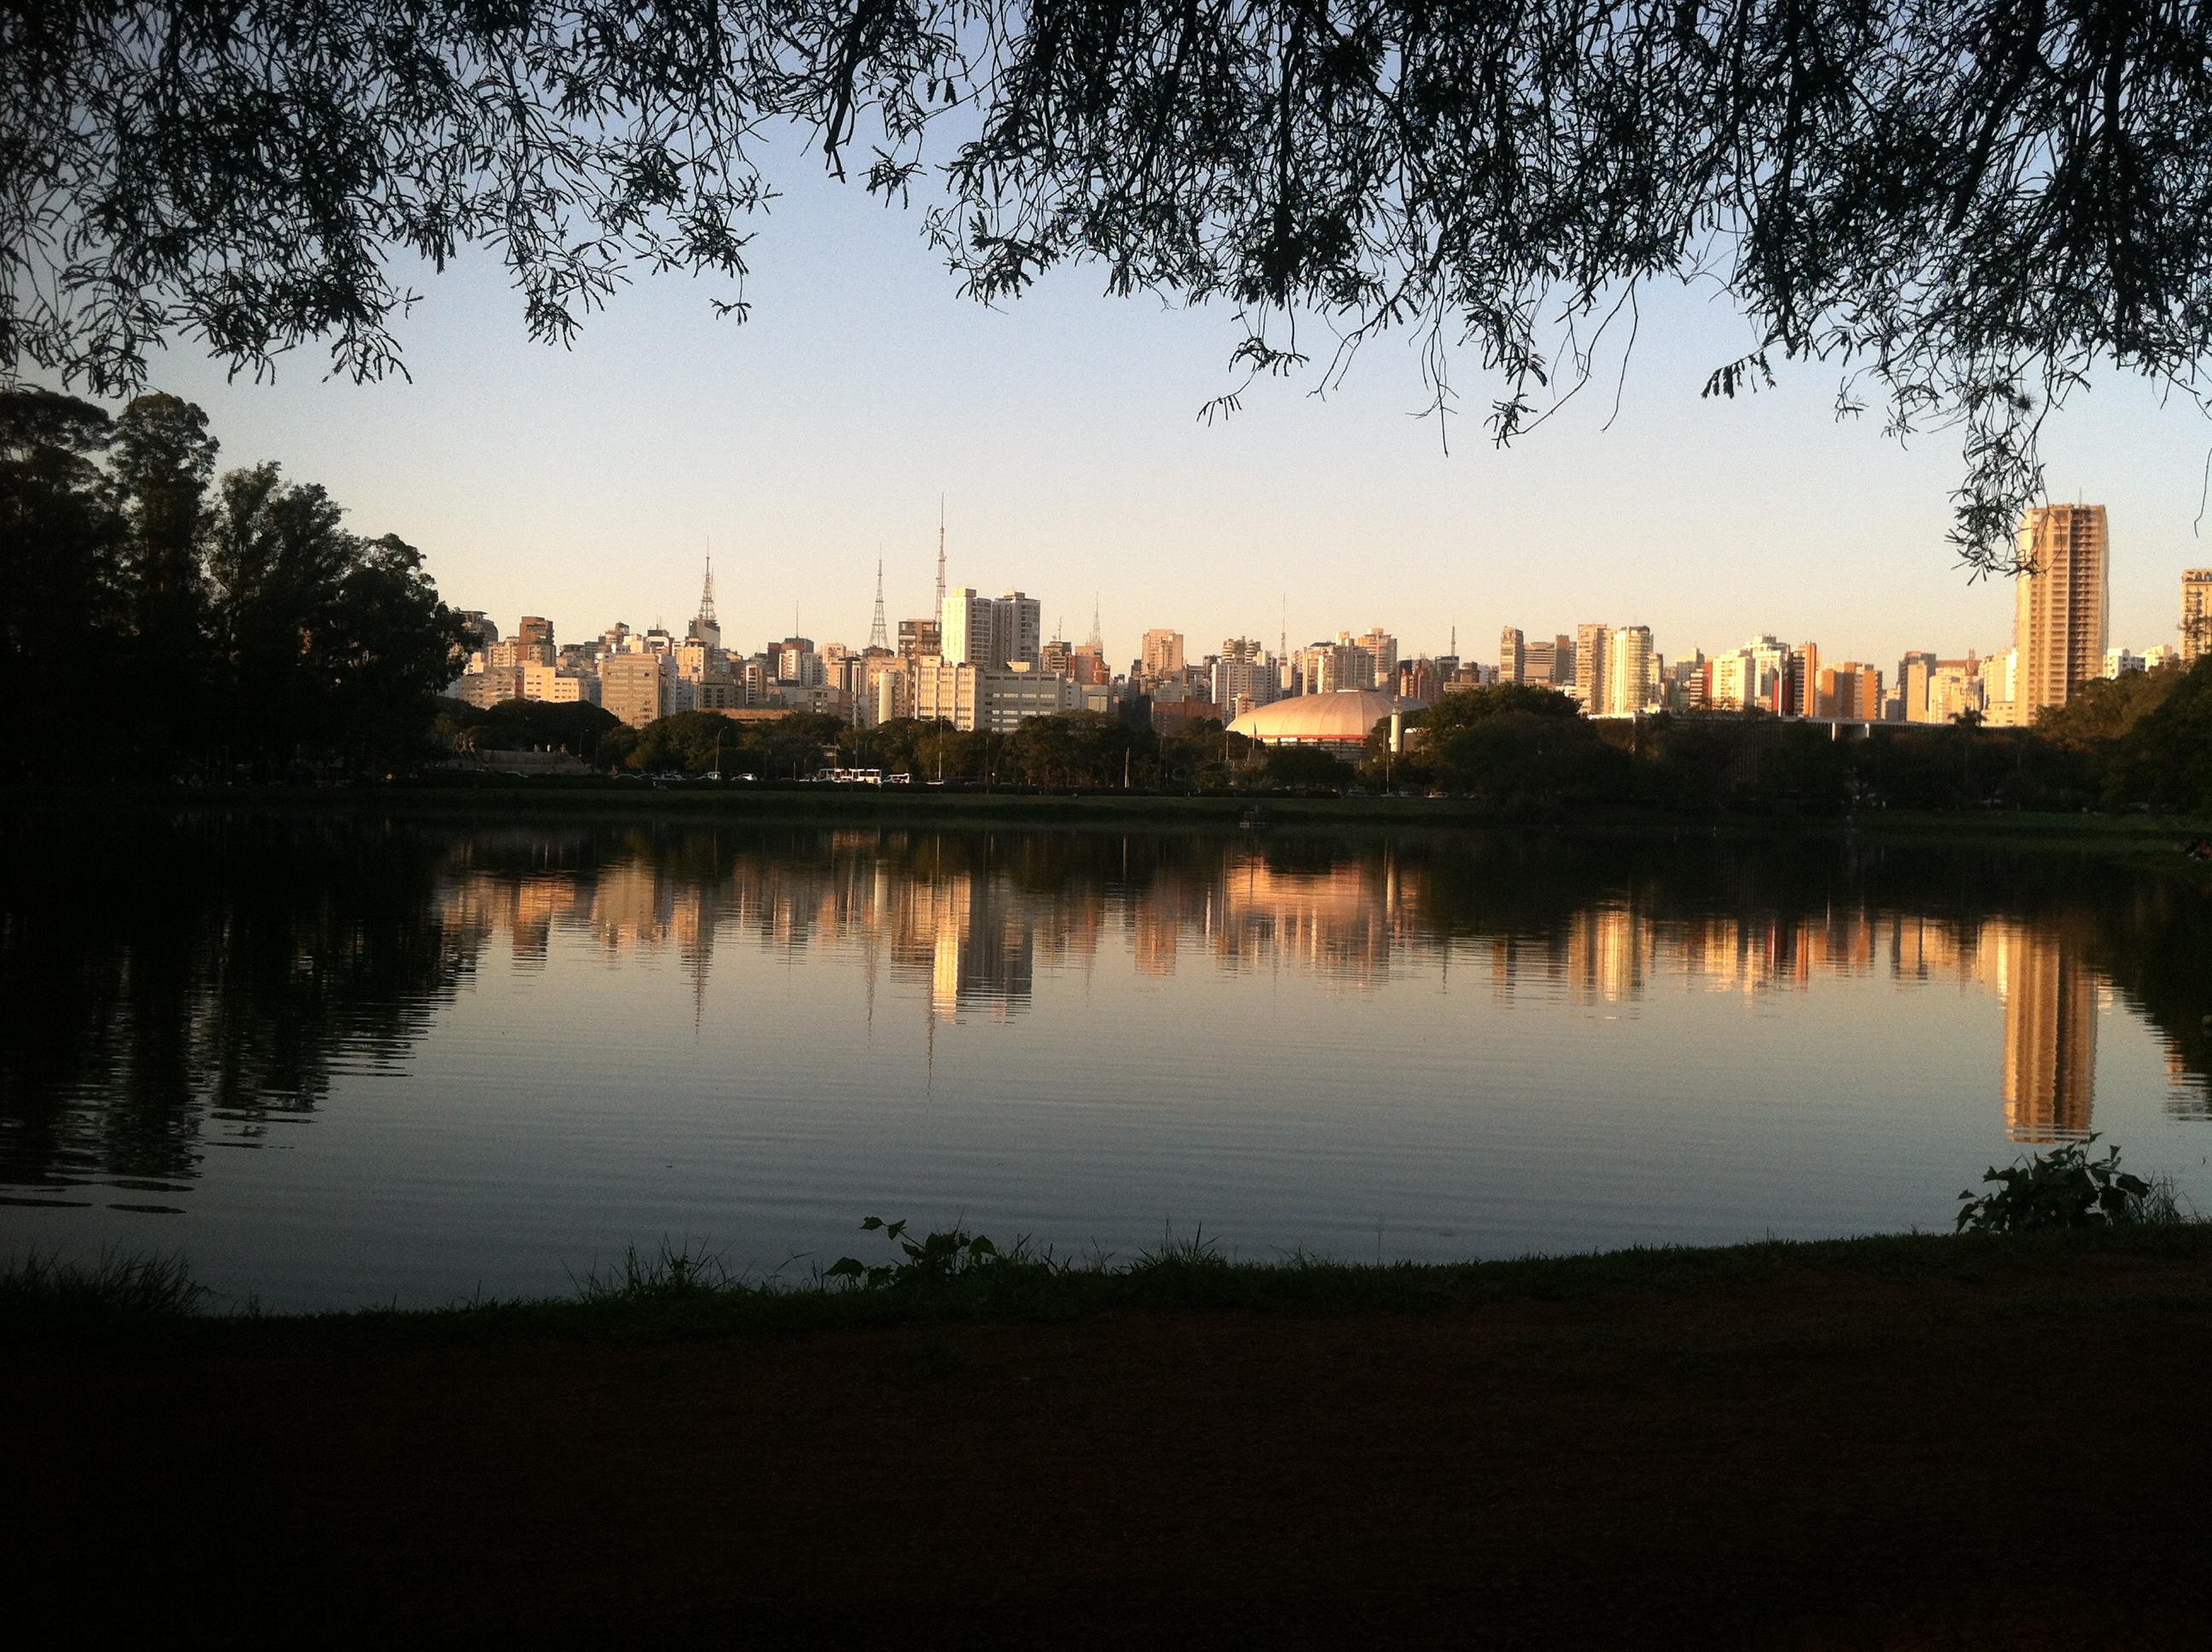 pretty, ne?  it's like the central park of sao paulo